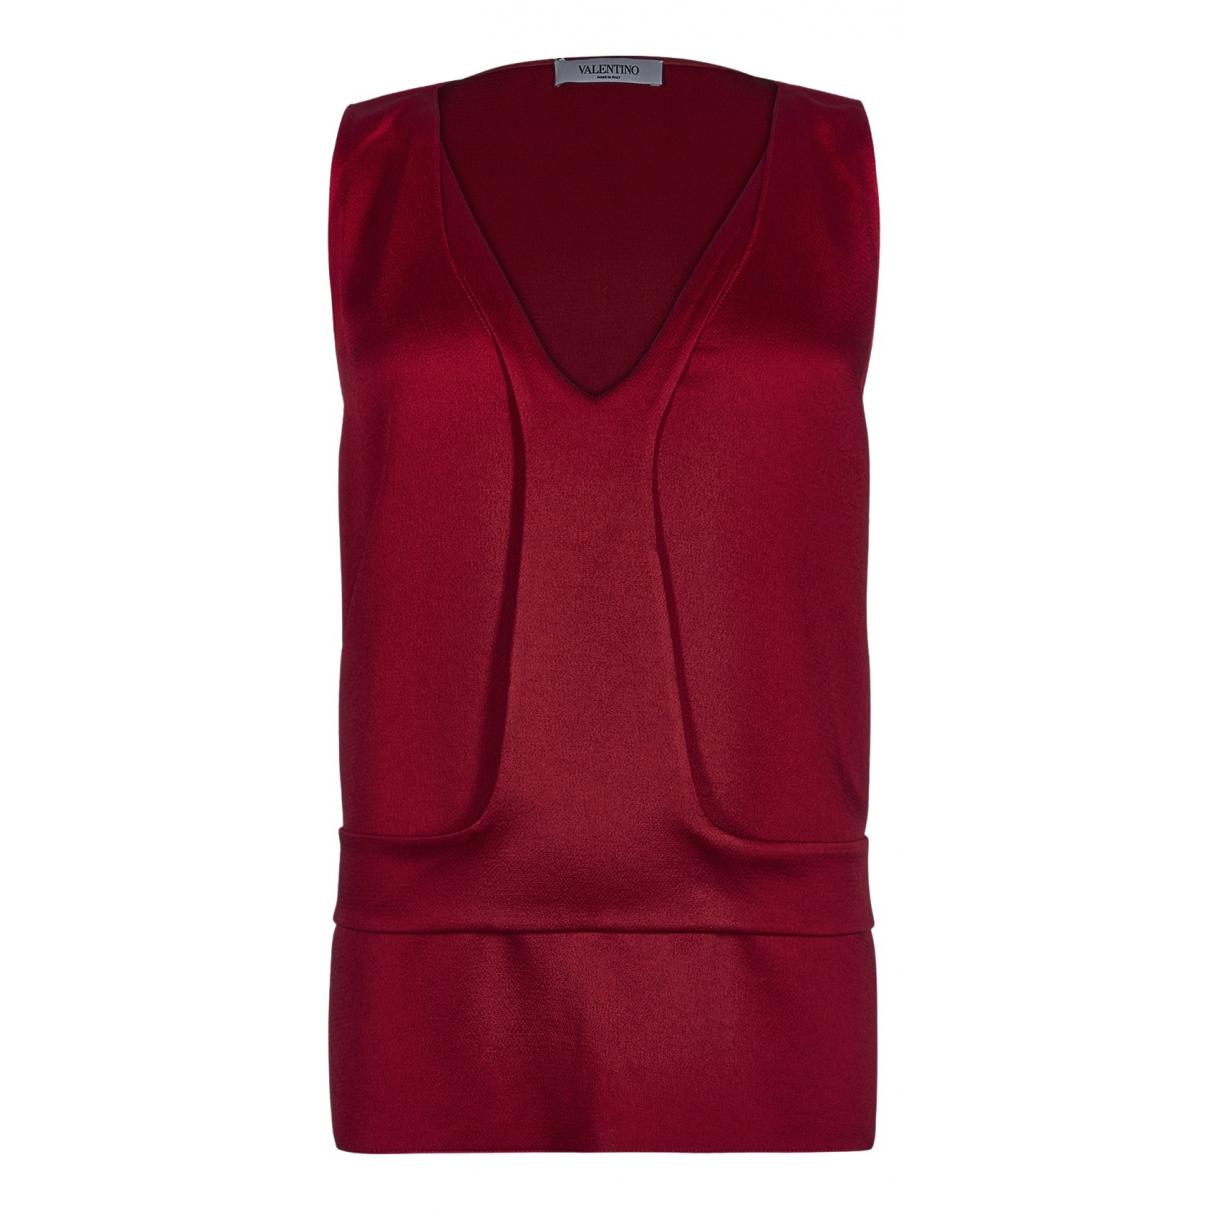 Valentino Garavani N Red  top for Women 16 UK